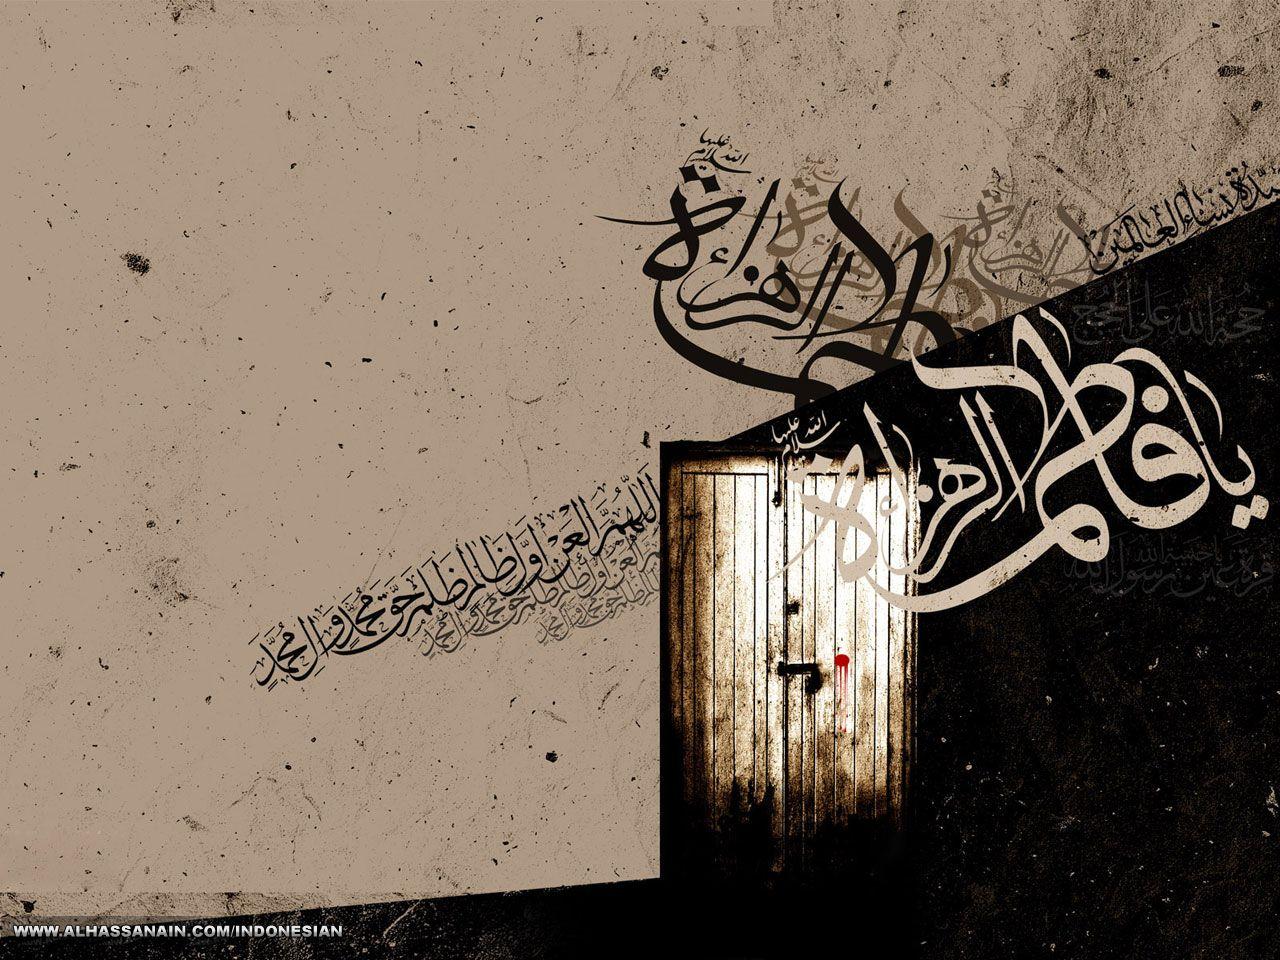 Keshahidan Sayidah Fatimah Az-Zahra